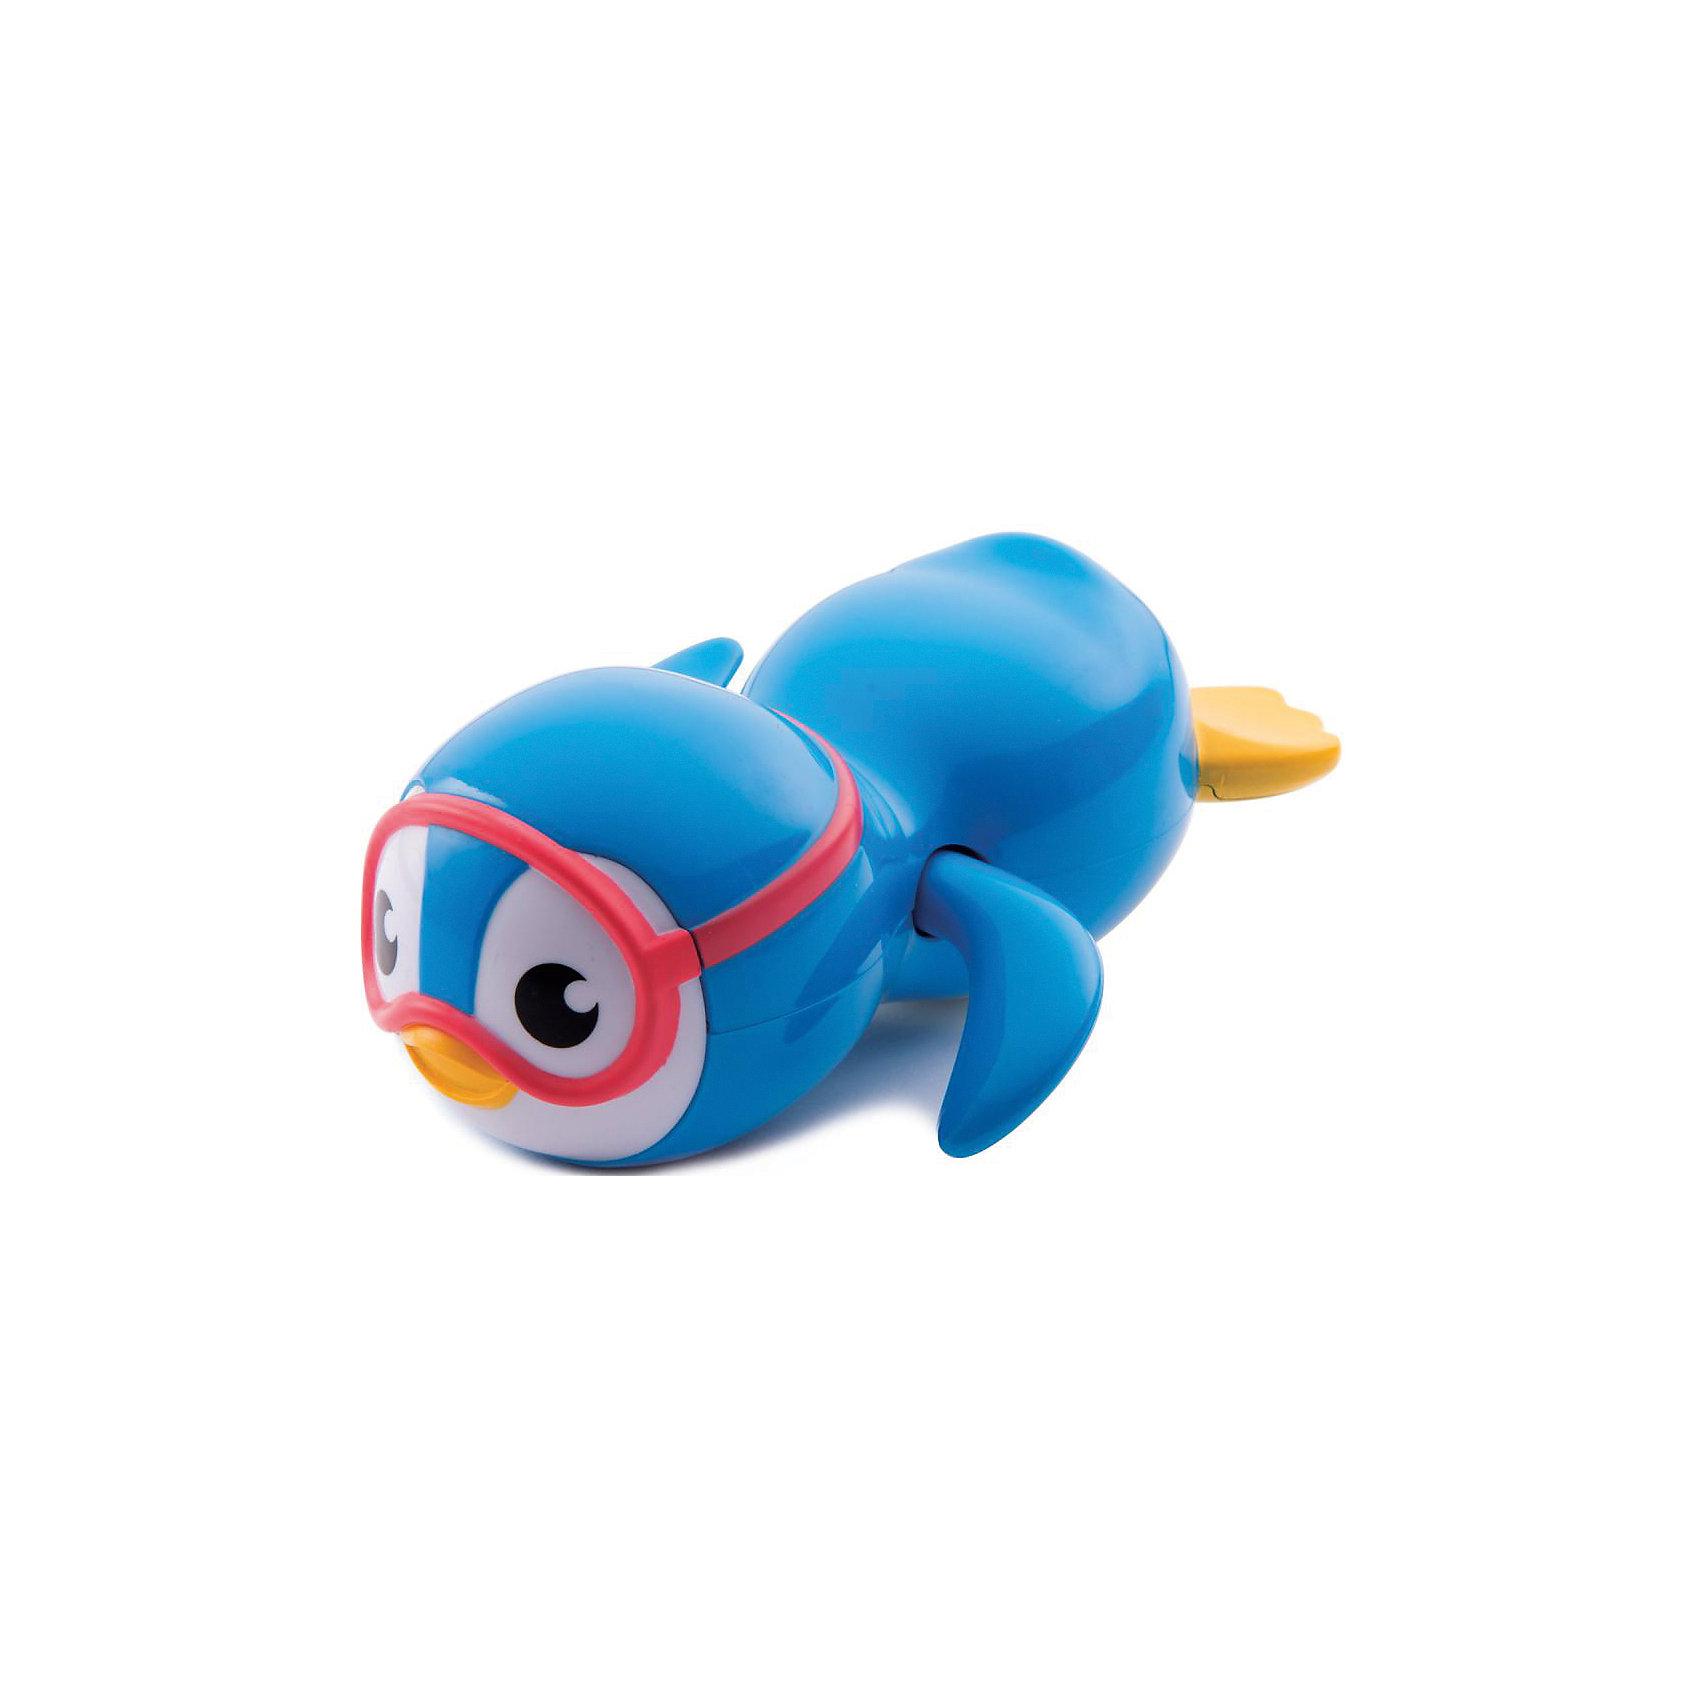 munchkin Игрушка для ванны Пингвин пловец 9+, Munchkin